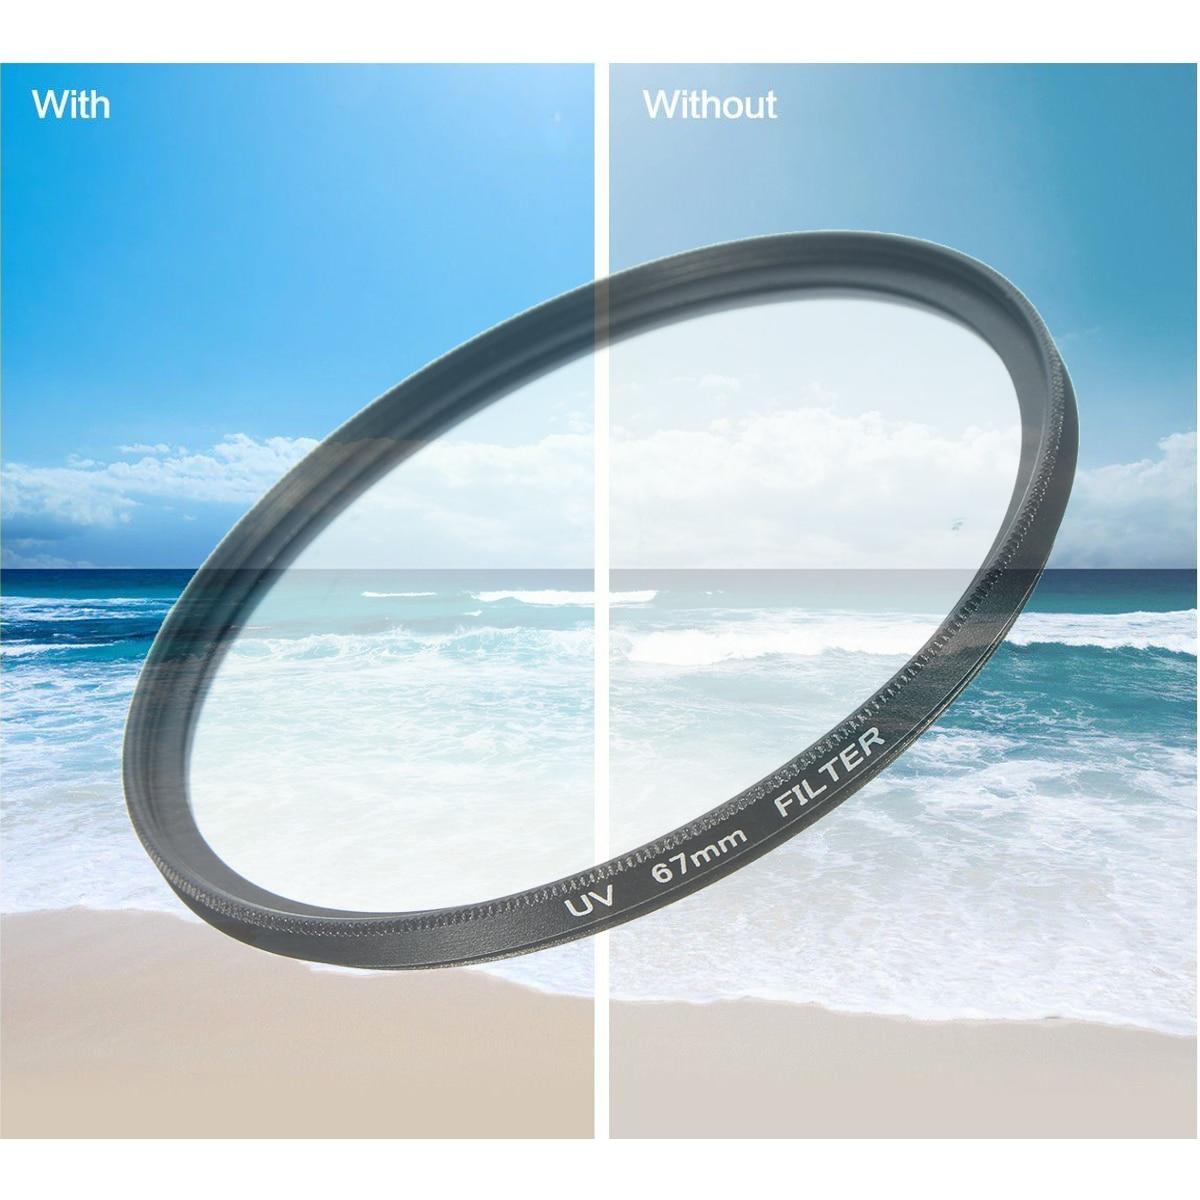 FidgetFidget 52//55//58//62//67//72//77mm Lens Macro Reverse Adapter Ring for Canon EOS/Camera 72mm